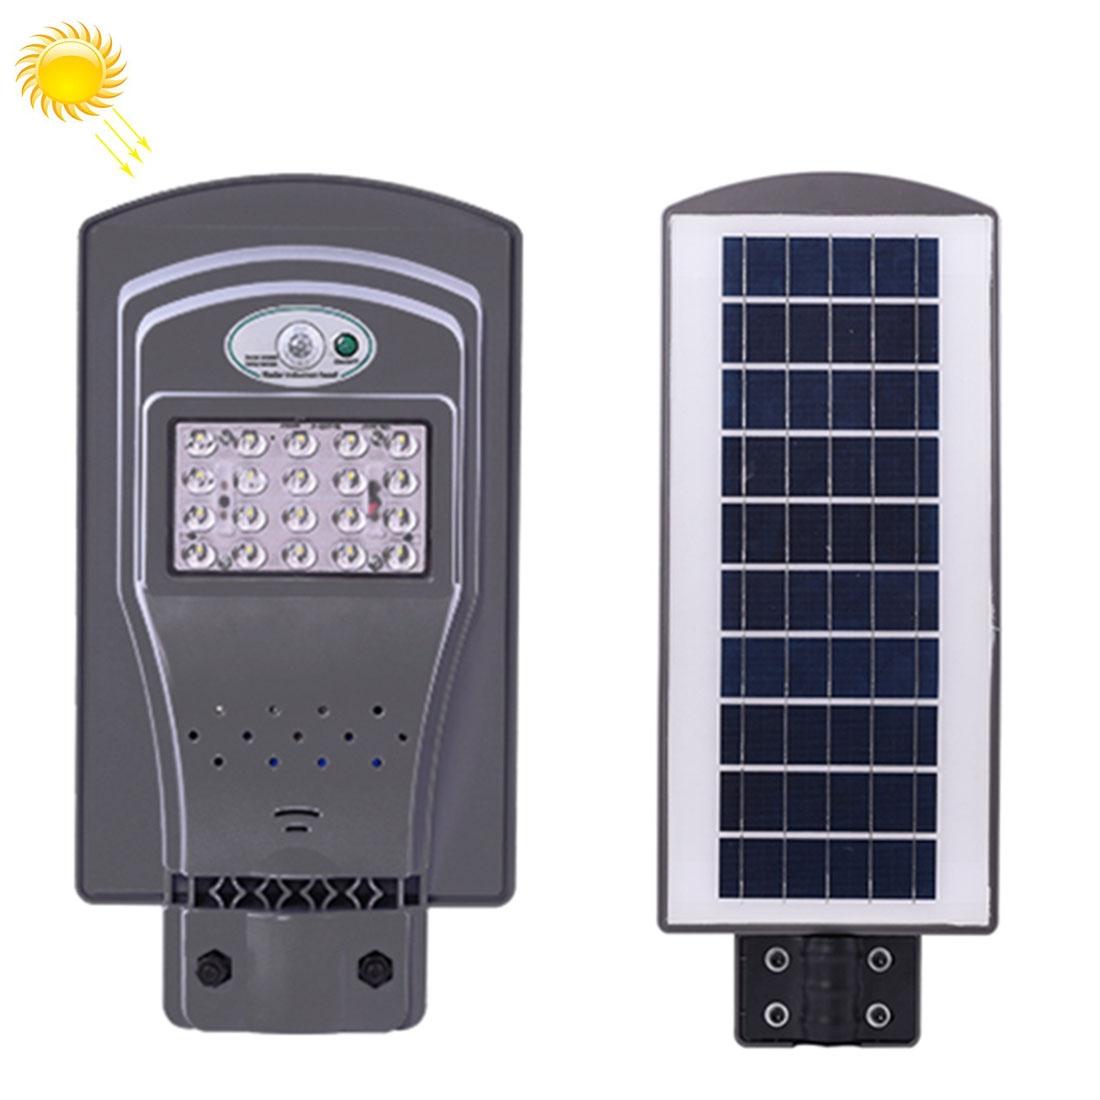 20W IP65 Waterproof Radar Sensor + Light Control Solar Power Street Light, 20 LEDs SMD 3030 Energy Saving Outdoor Lamp with 6V / 12W Solar Panel